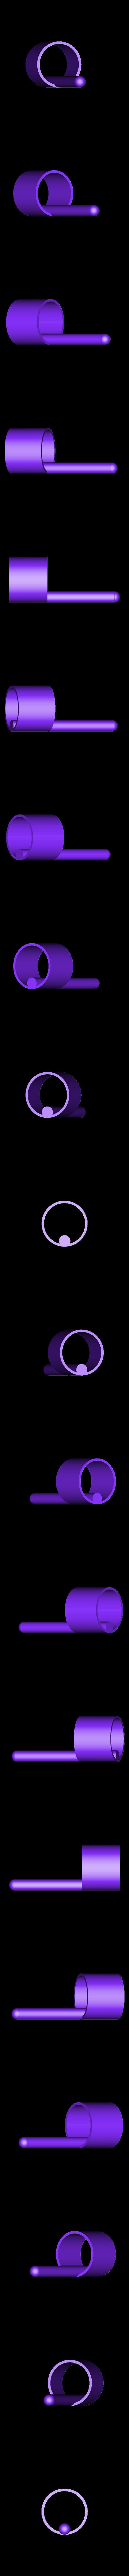 tool_holder_V2.stl Télécharger fichier STL gratuit Porte-outils Creality Ender 2 • Design pour impression 3D, pgraaff